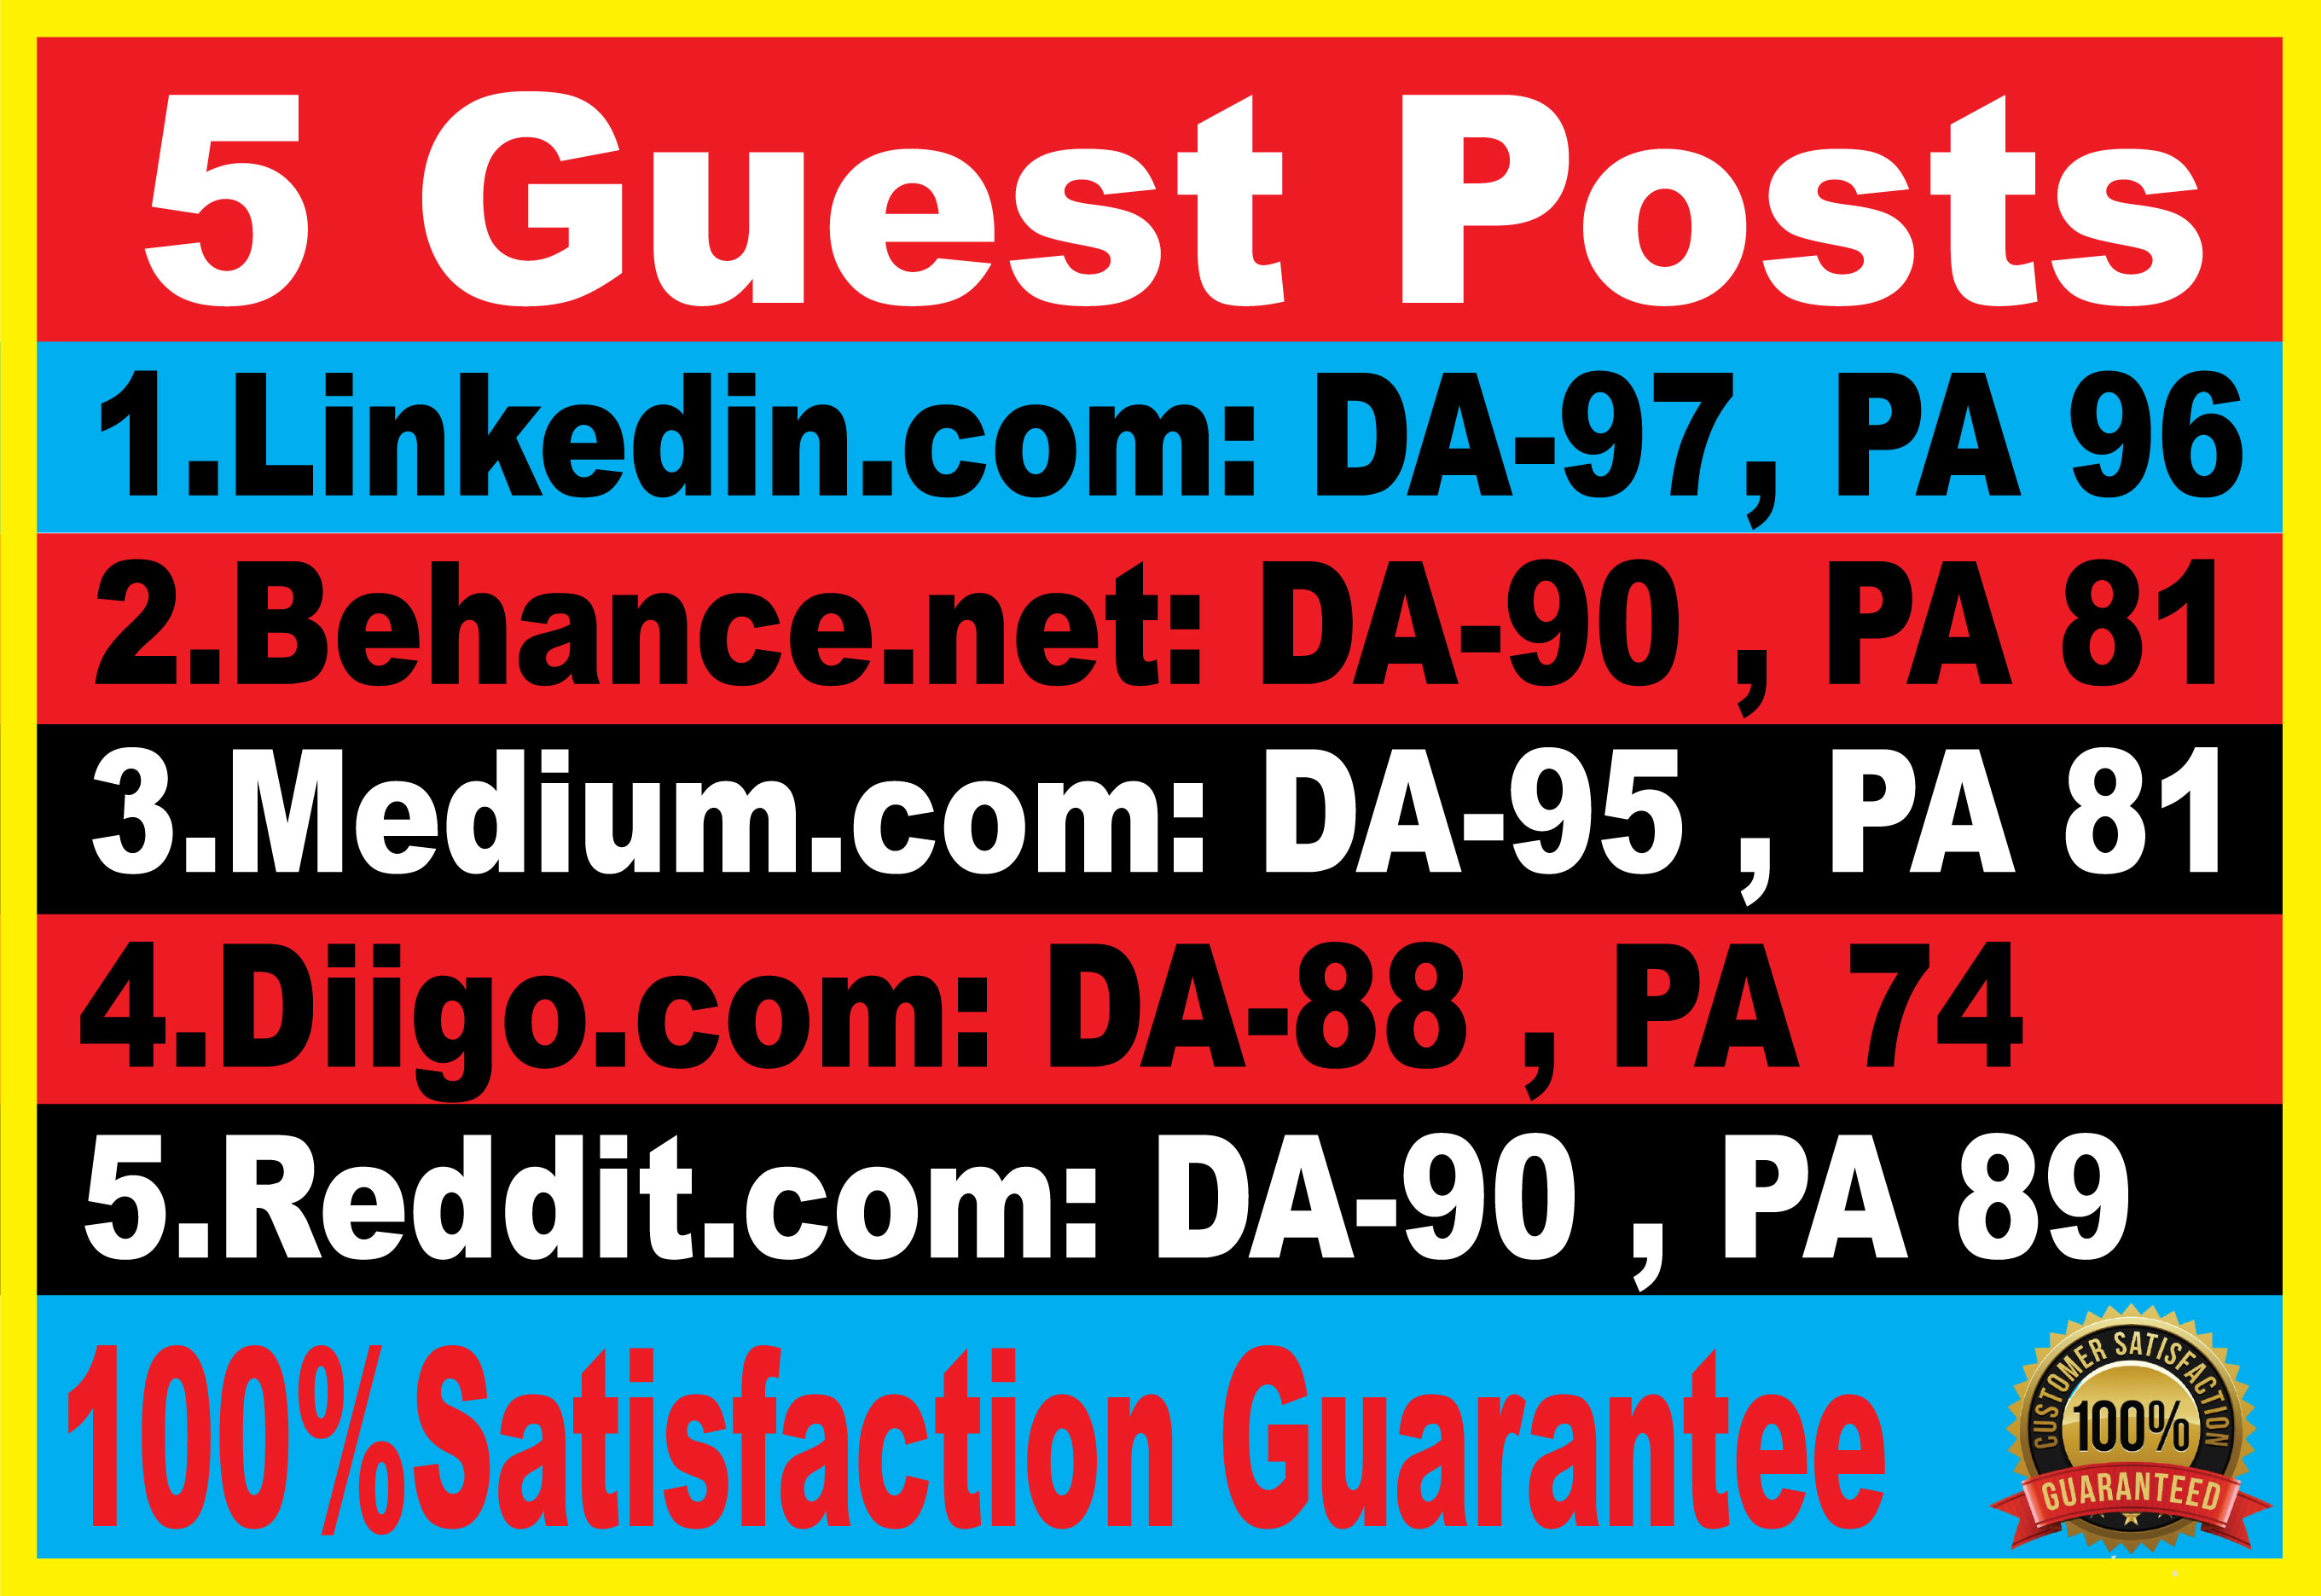 Publish 5 Guest Posts on Linkedin, Behance, Medium, Diigo, Reddit - High DA90 & PA89